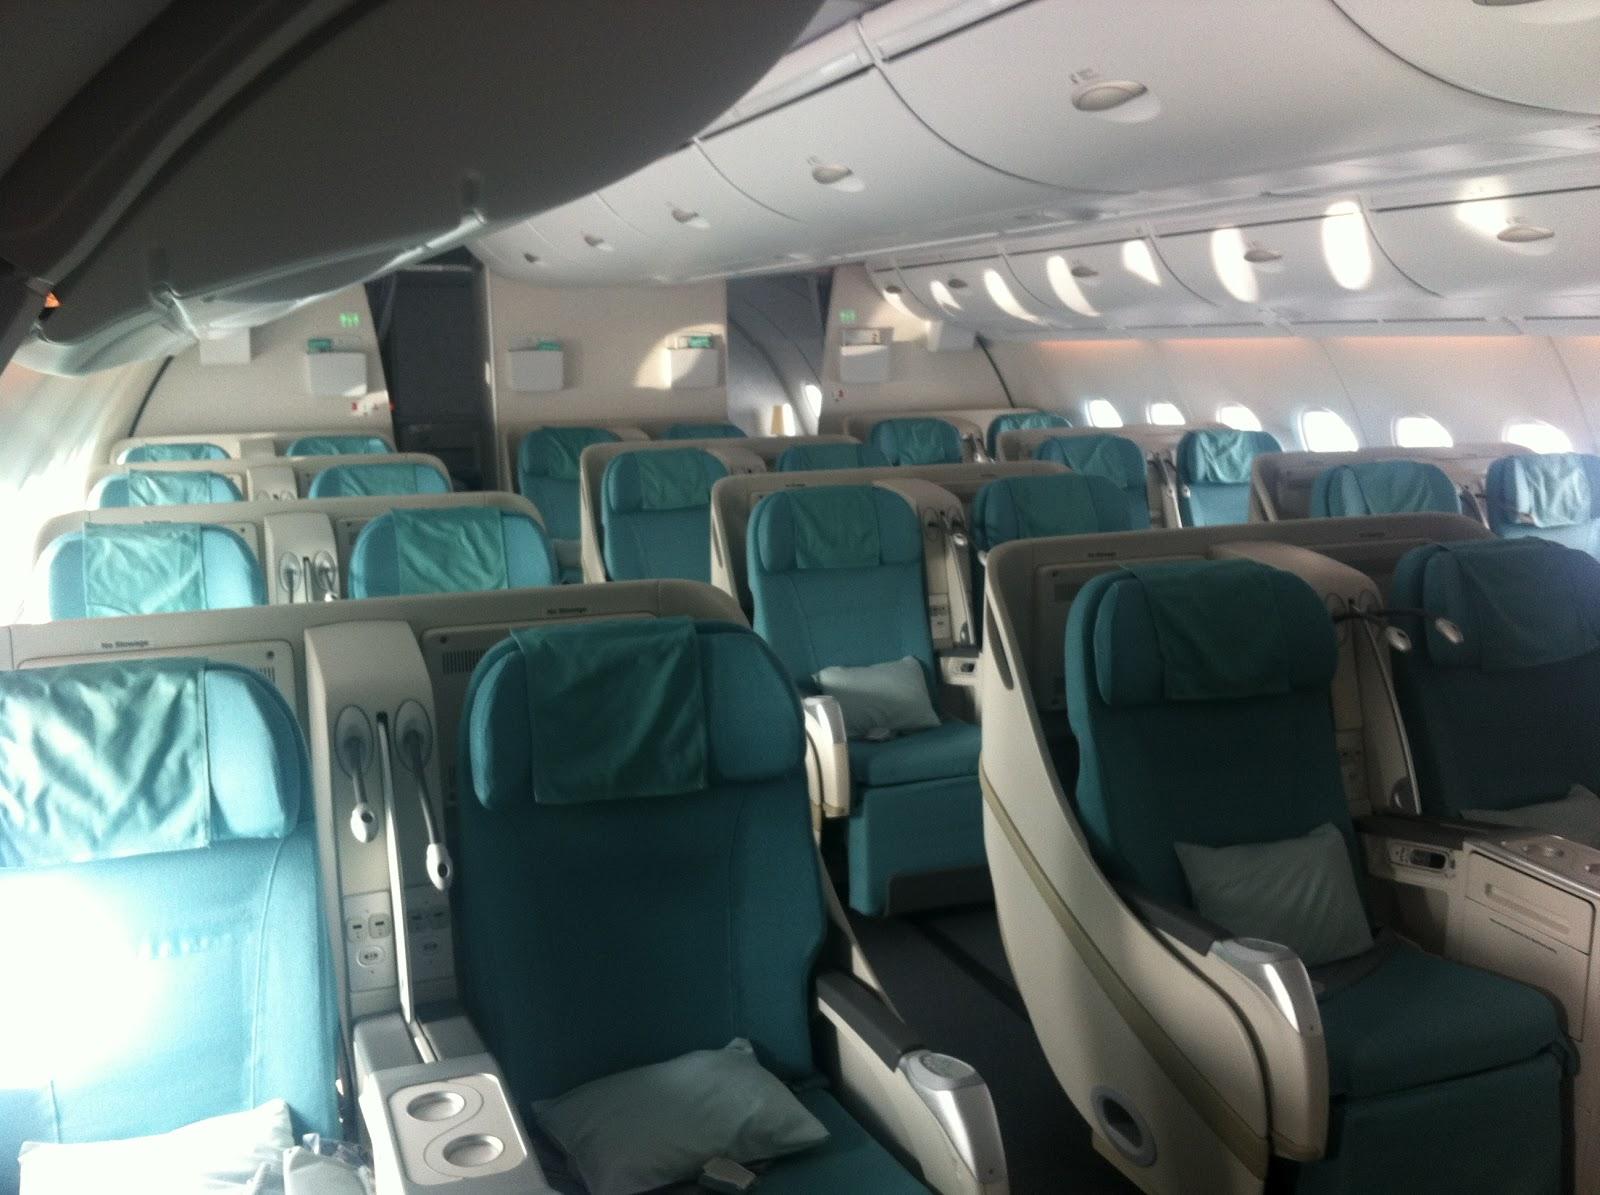 korean air a380 business class seoul new york tripatini. Black Bedroom Furniture Sets. Home Design Ideas